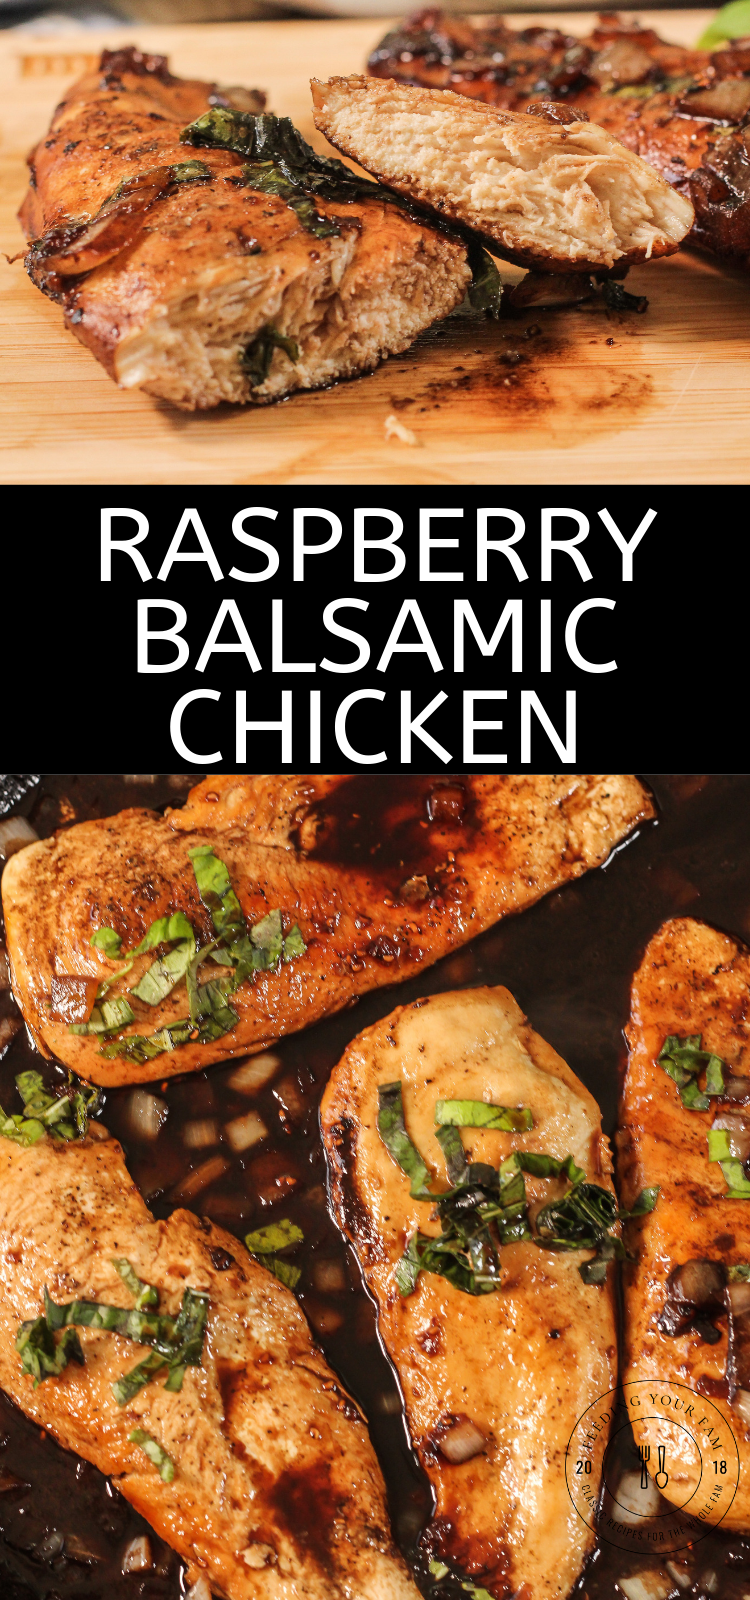 pinterest image of balsamic chicken